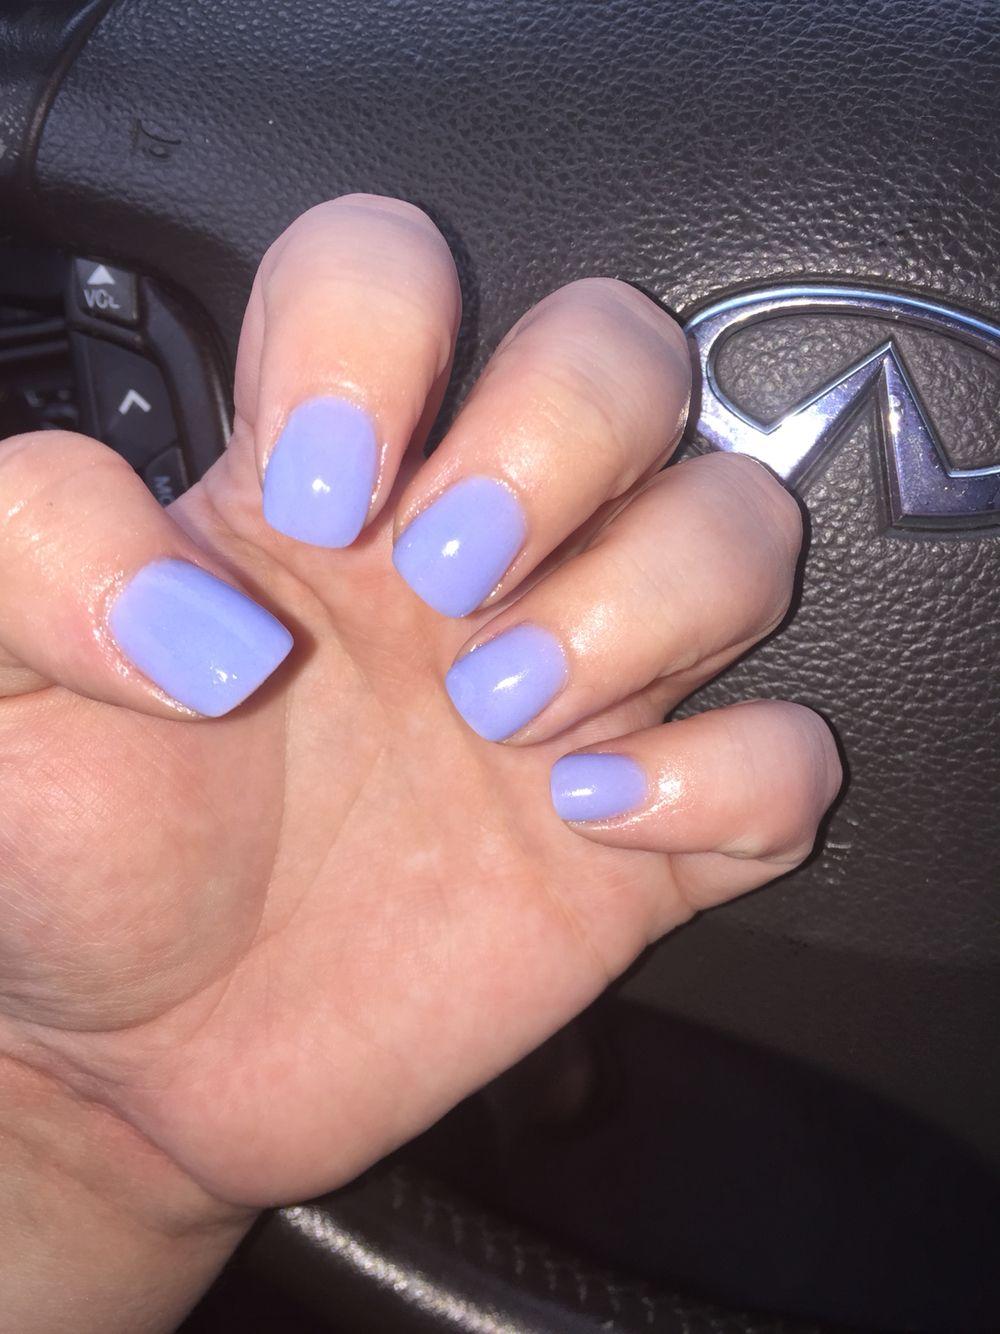 Nexgen Nails For Spring Time Nexgen Nails Nexgen Nails Colors Dipped Nails